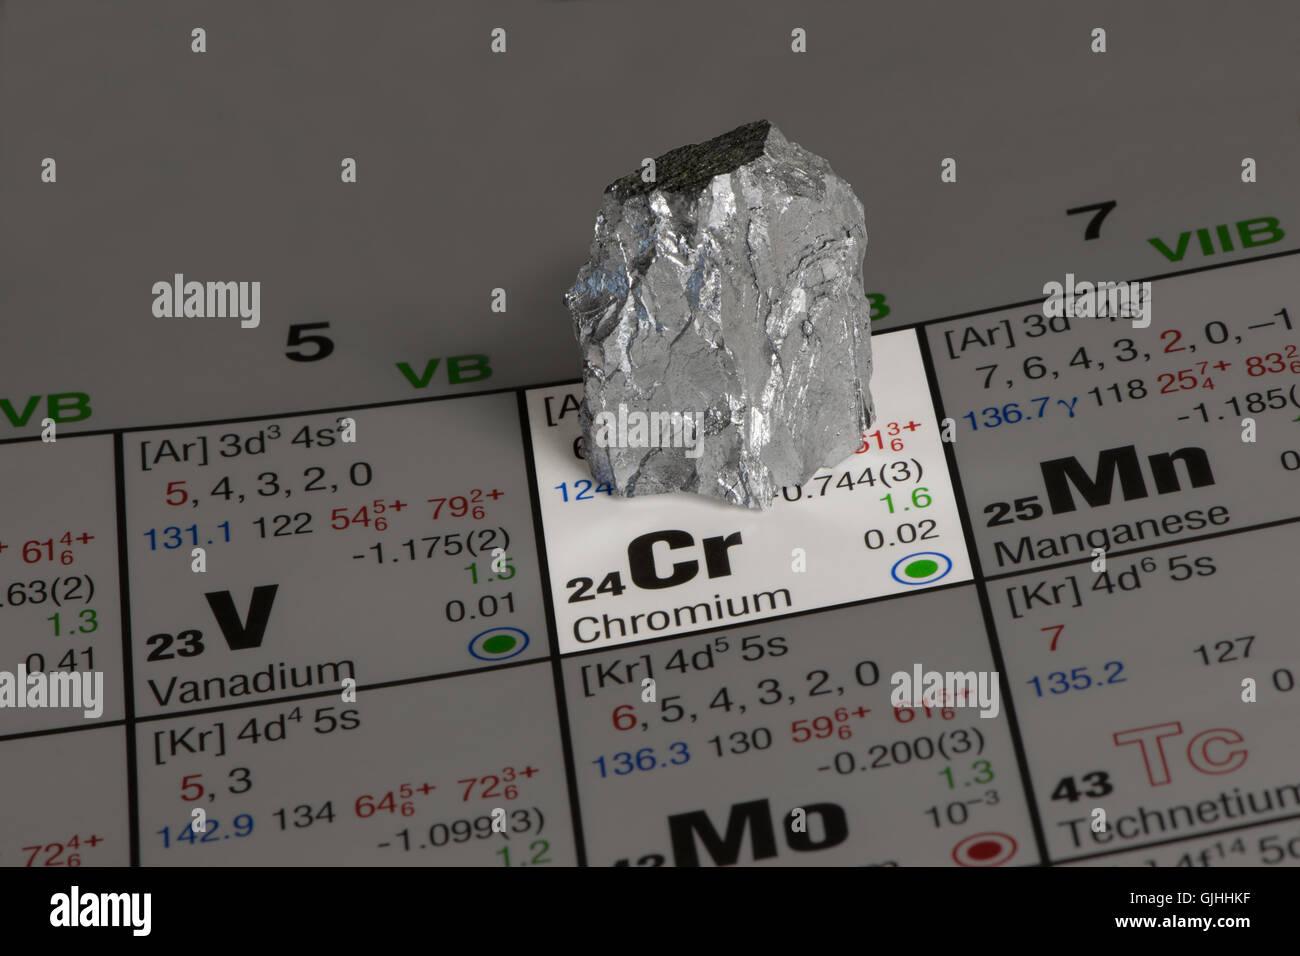 Chromium On Periodic Table Of Elements Stock Photo 114713075 Alamy